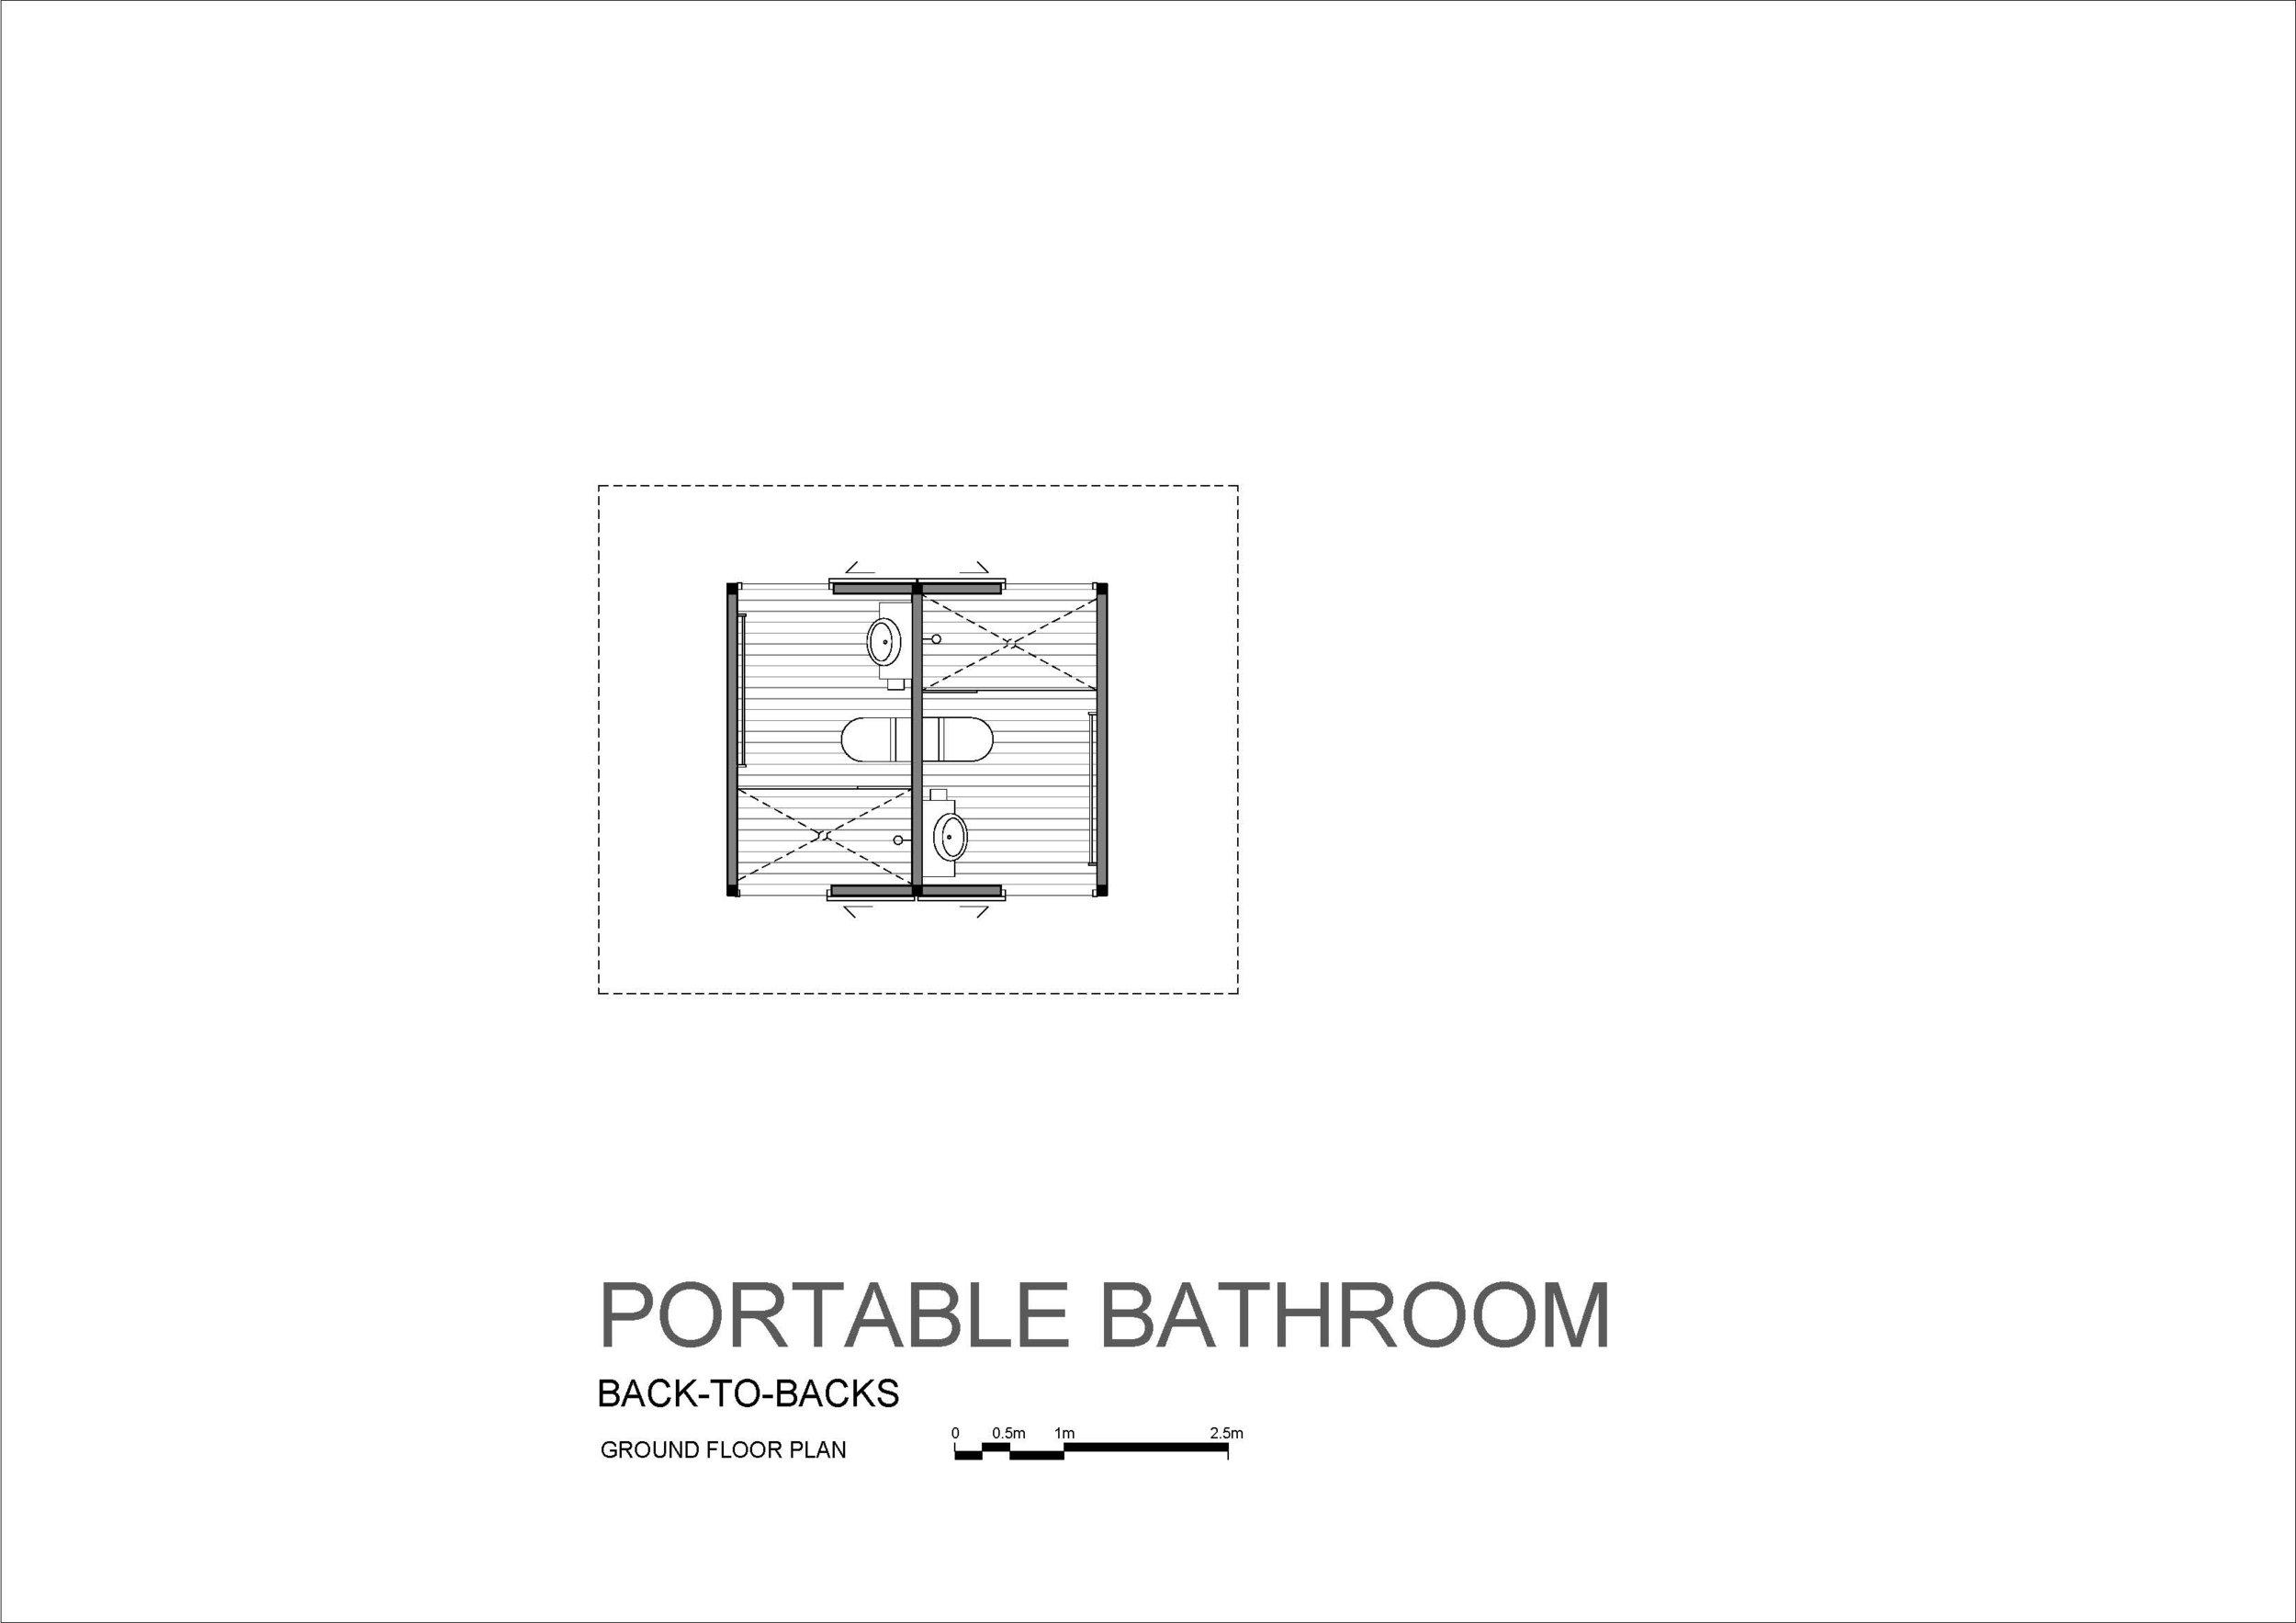 PORTABLE BATHROOM_Page_6.jpg